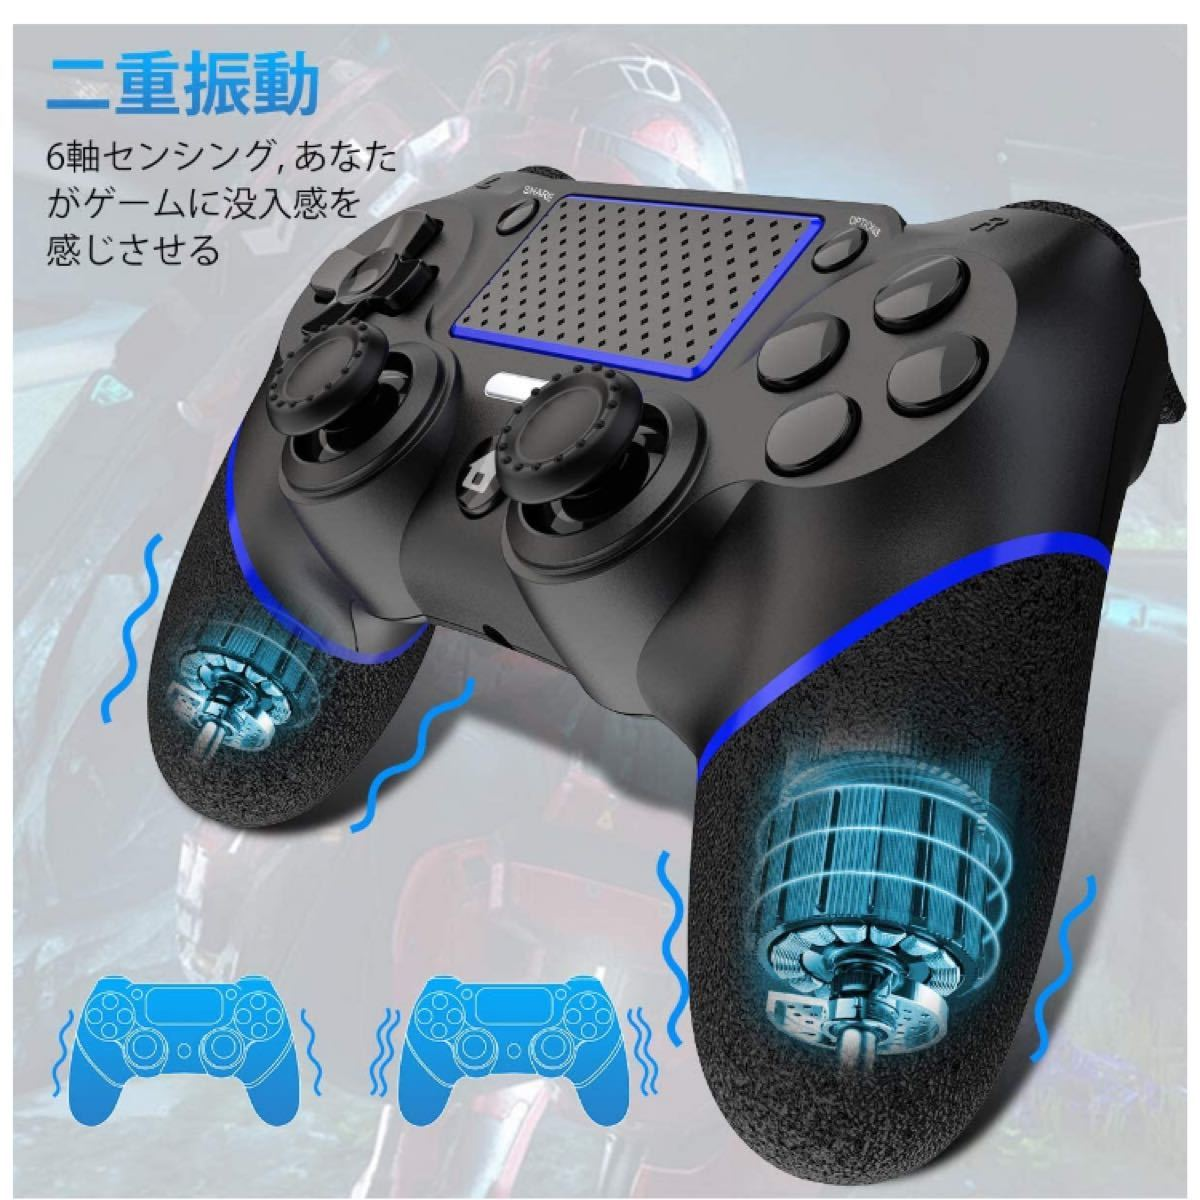 PS4 コントローラー ワイヤレス TECKLINE PS4 ワイヤレス ゲーム